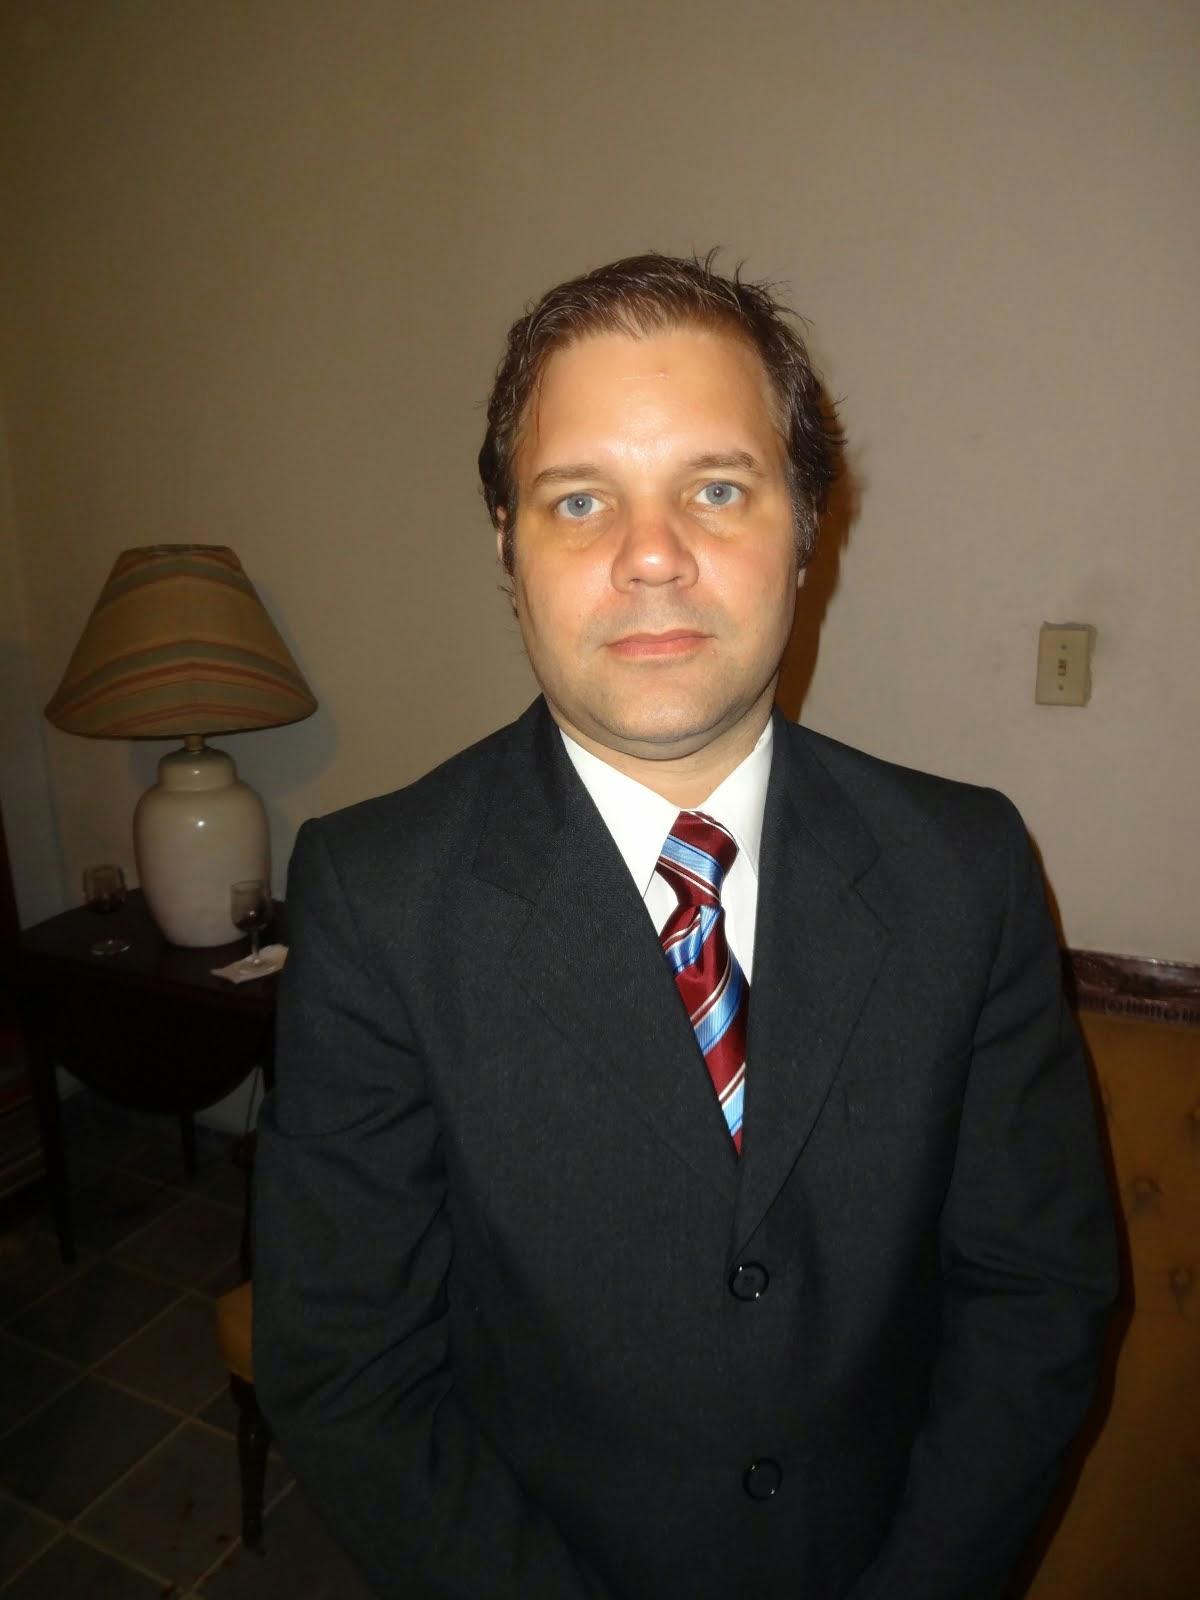 Lic. Joan Manuel Ferrer Rodríguez